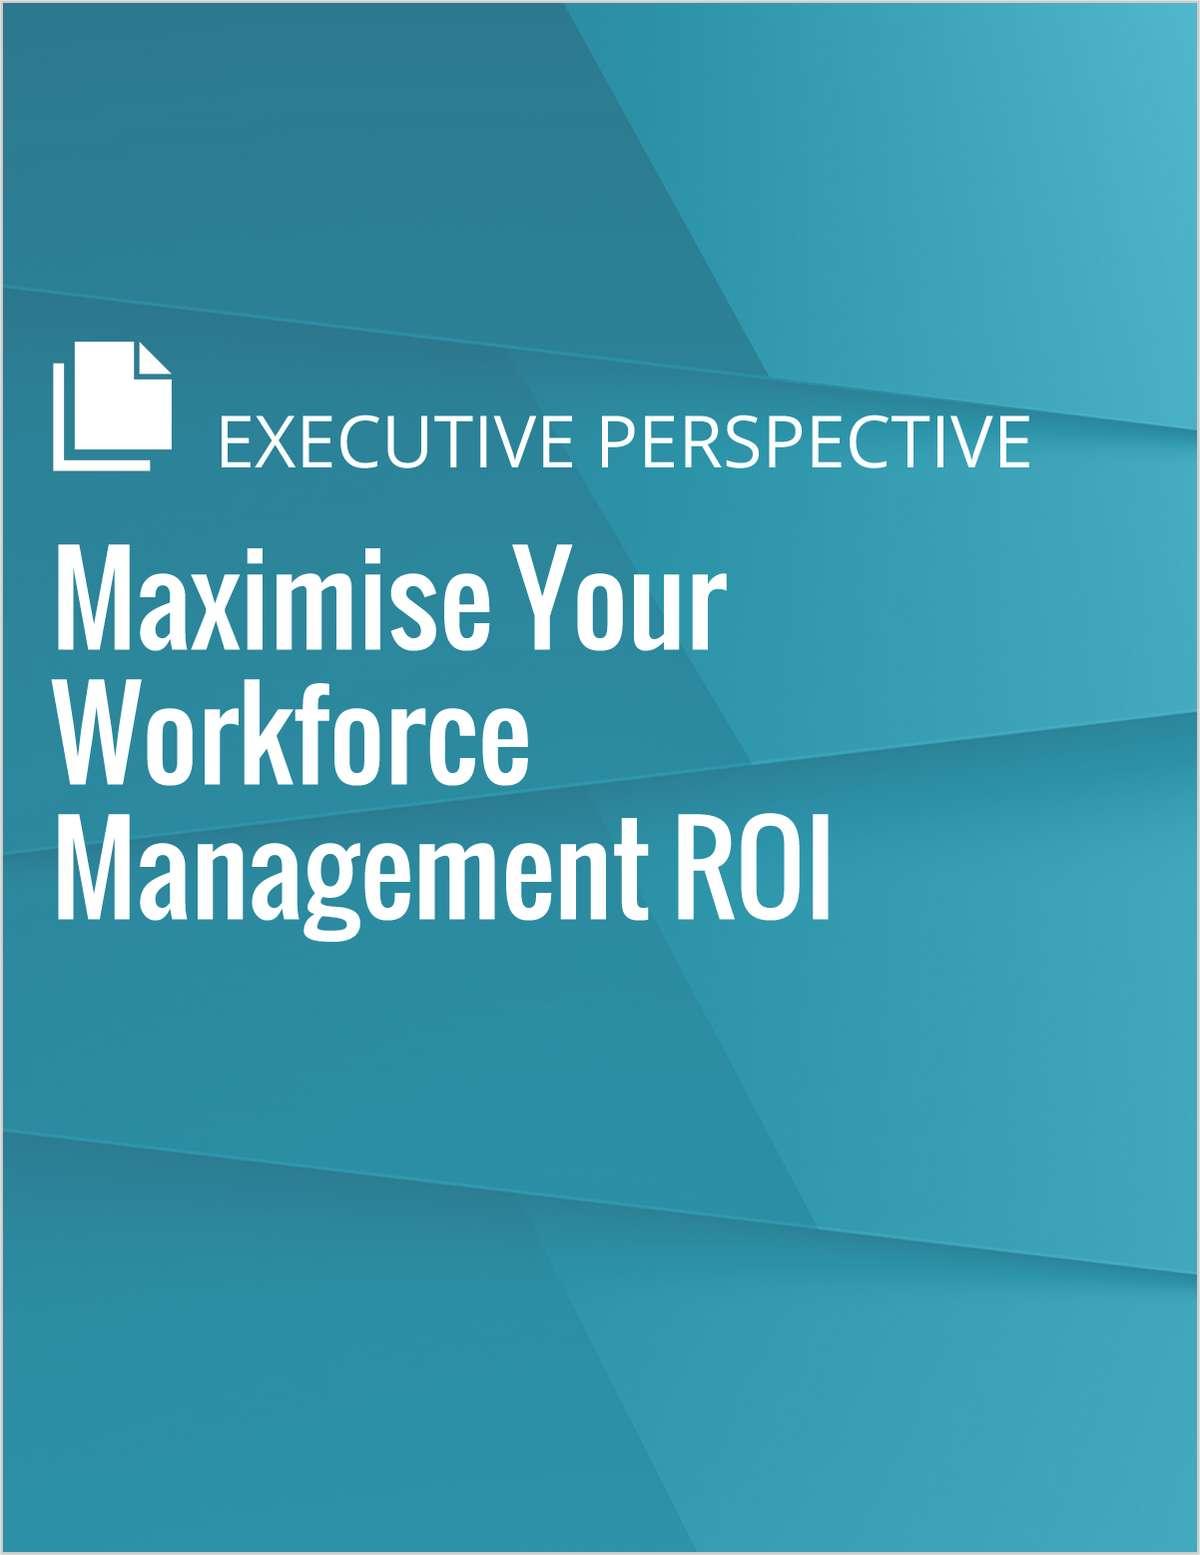 Maximise Your Workforce Management ROI